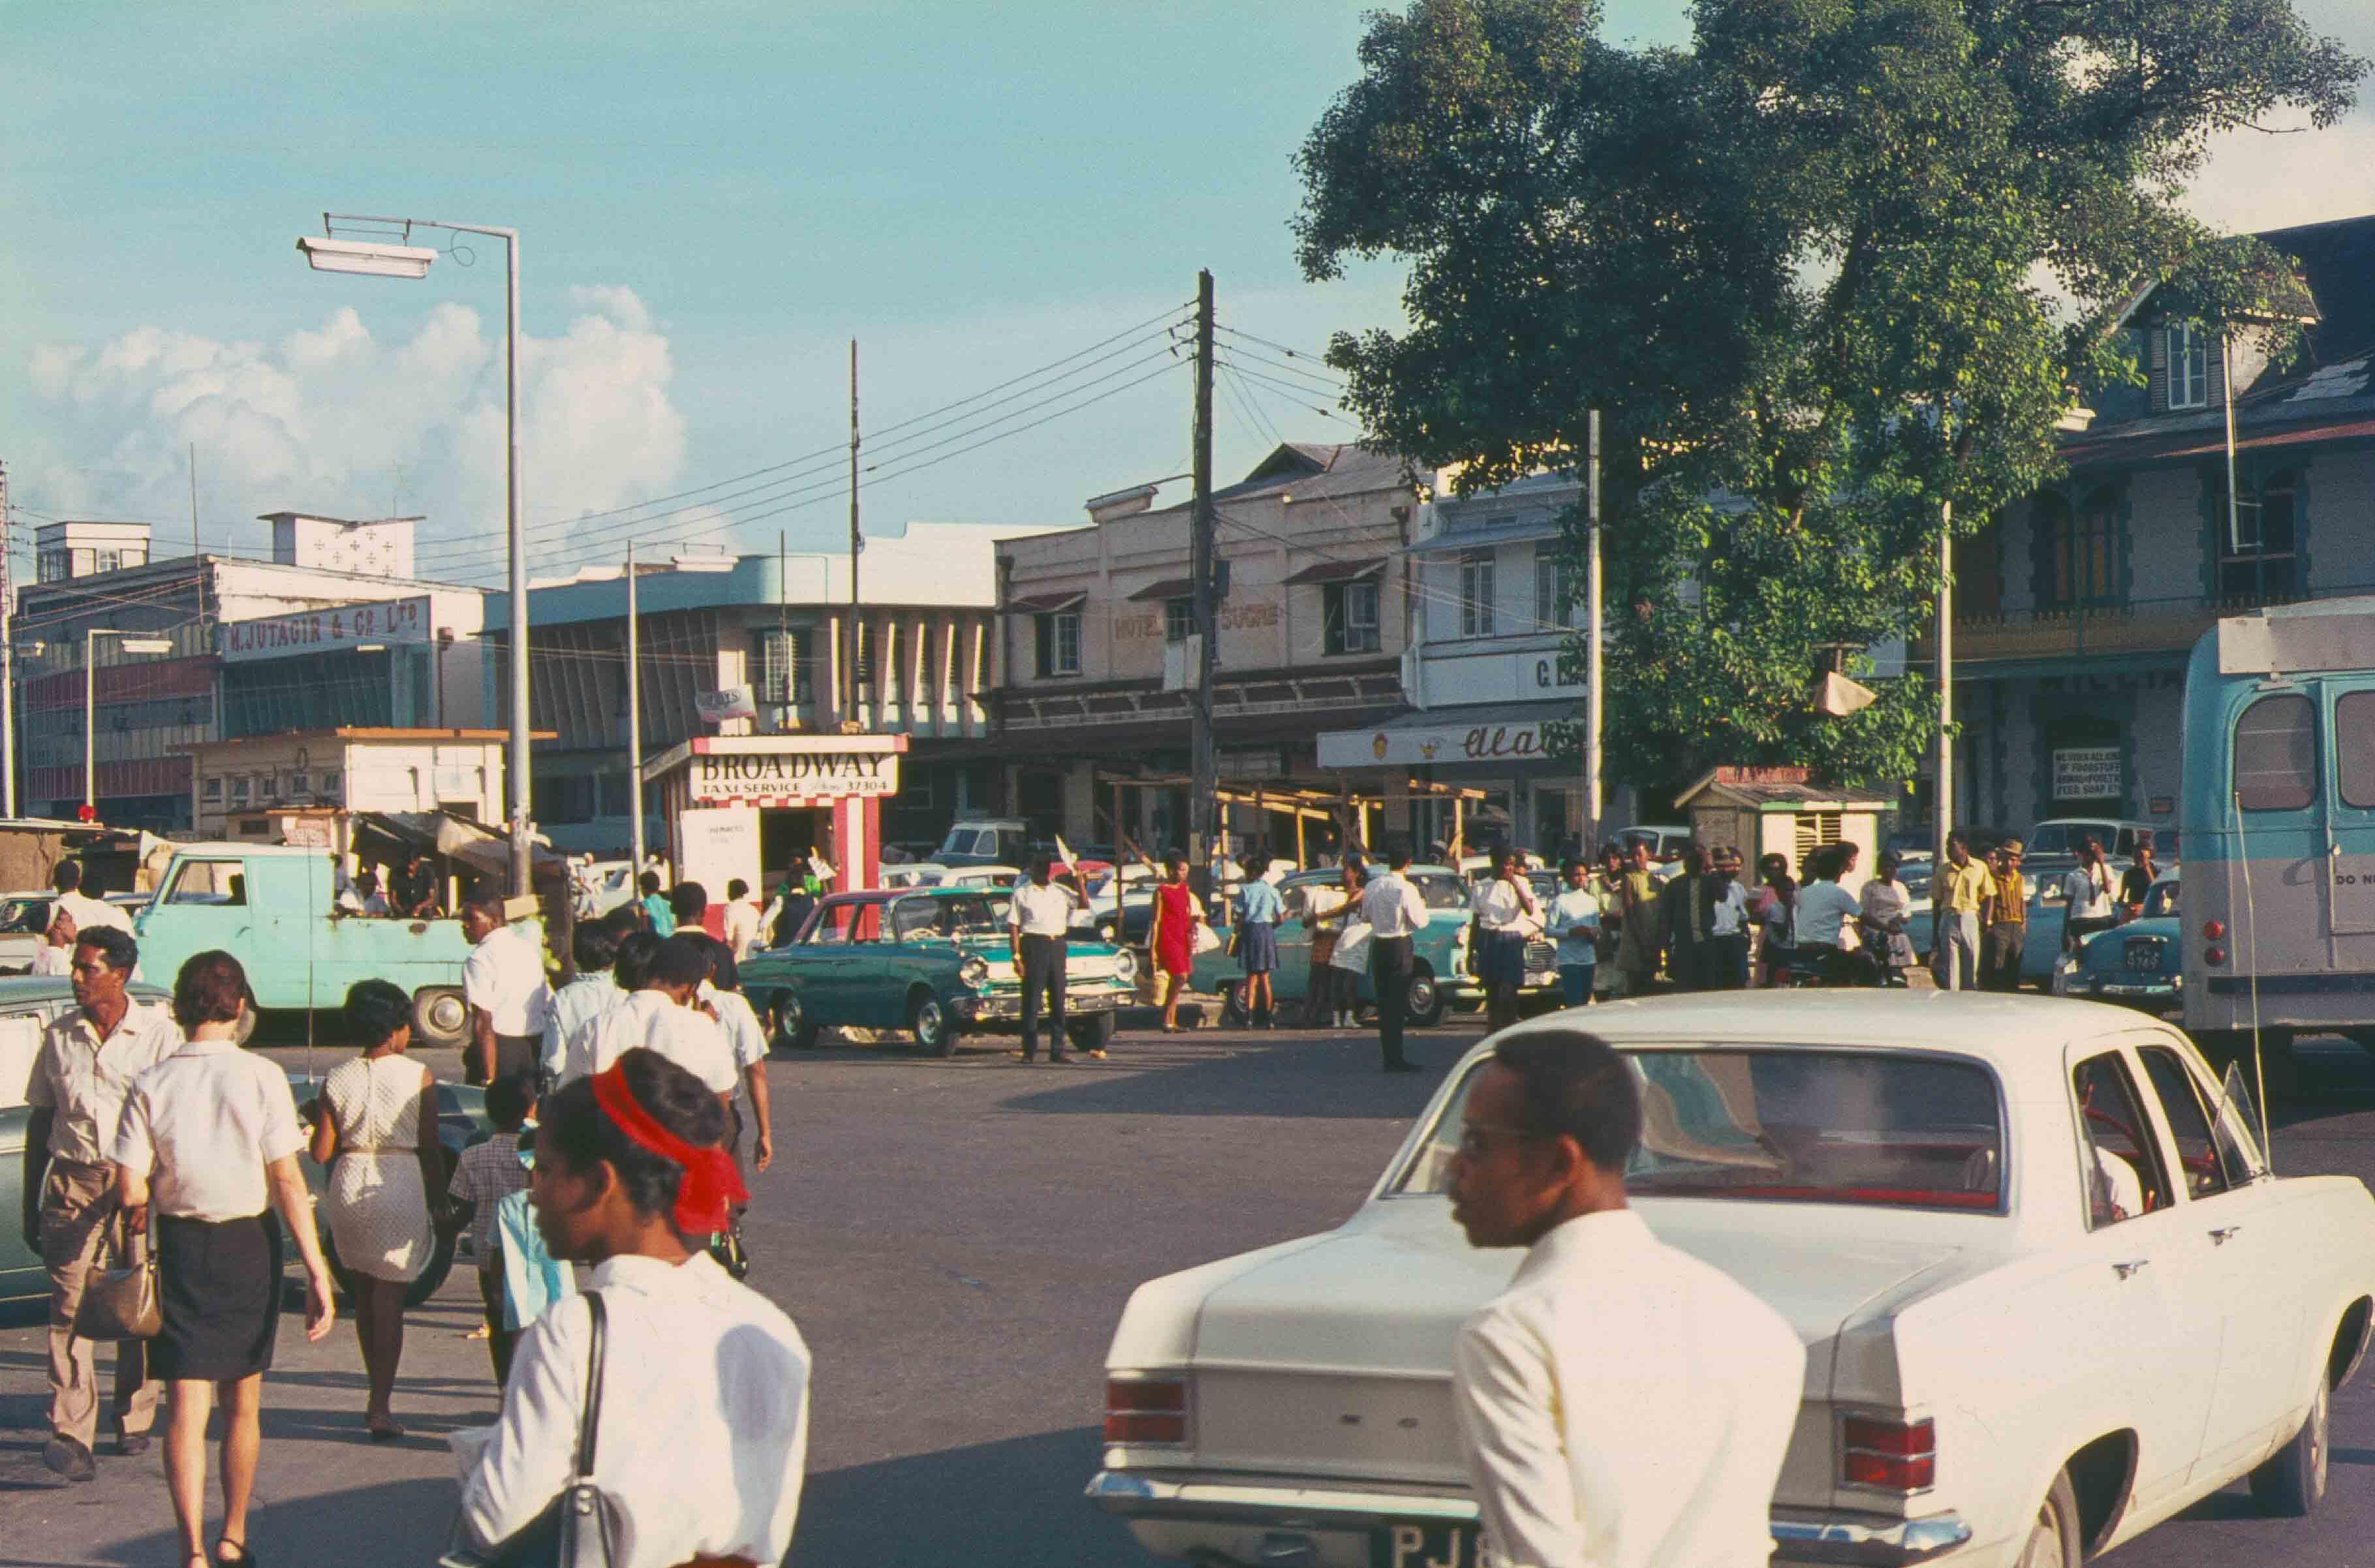 600. Suriname